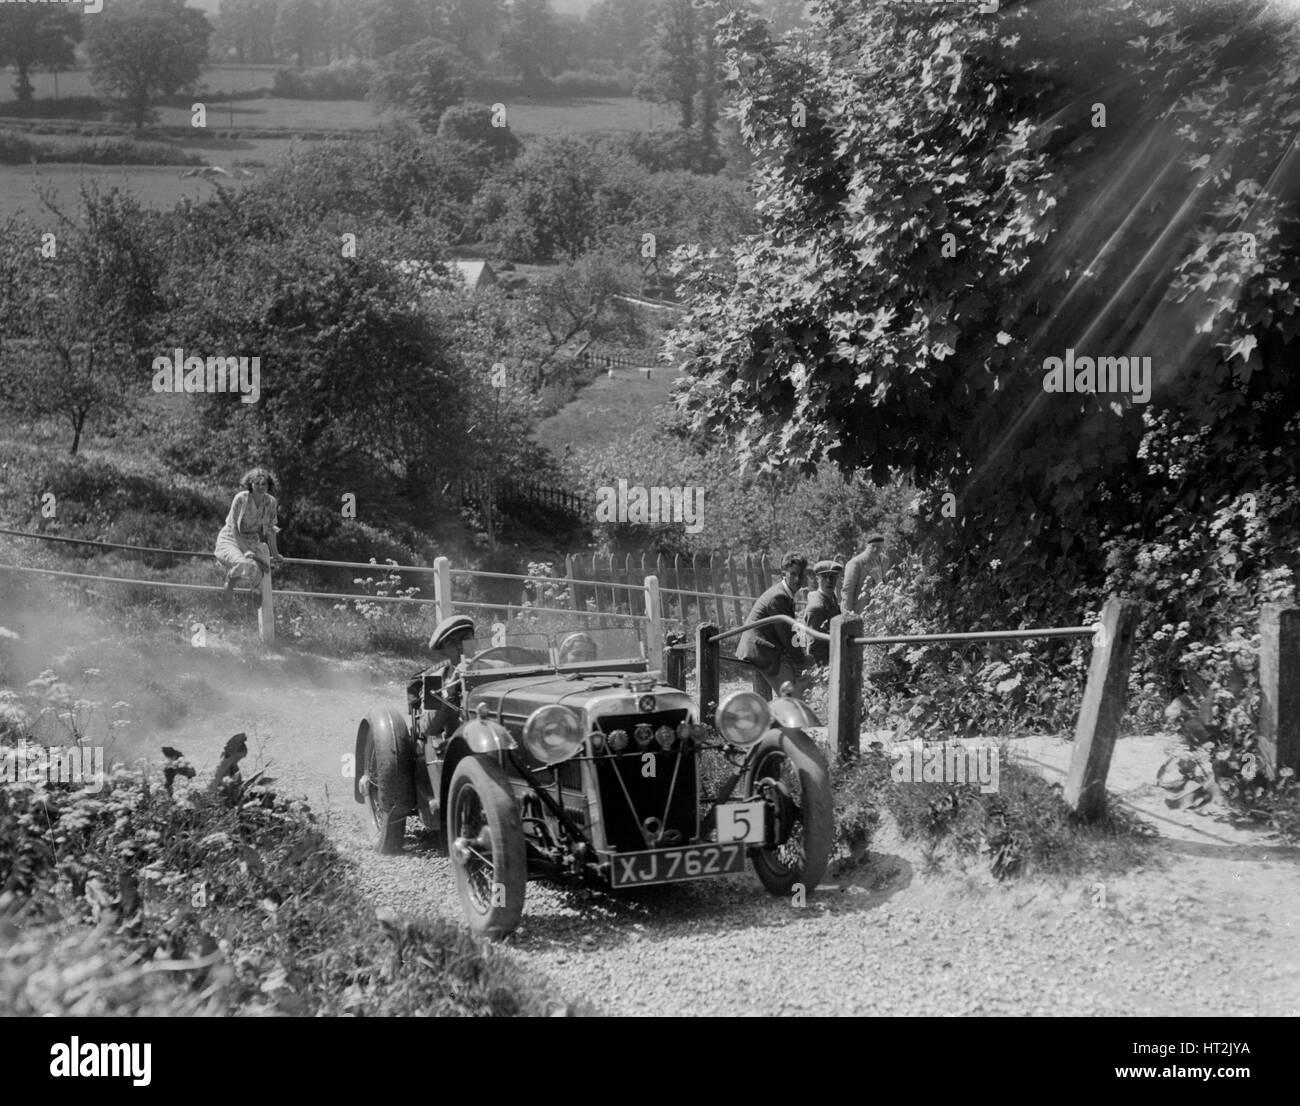 1933 Crossley Ten taking part in a West Hants Light Car Club Trial, Ibberton Hill, Dorset, 1930s. Artist: Bill Brunell. - Stock Image